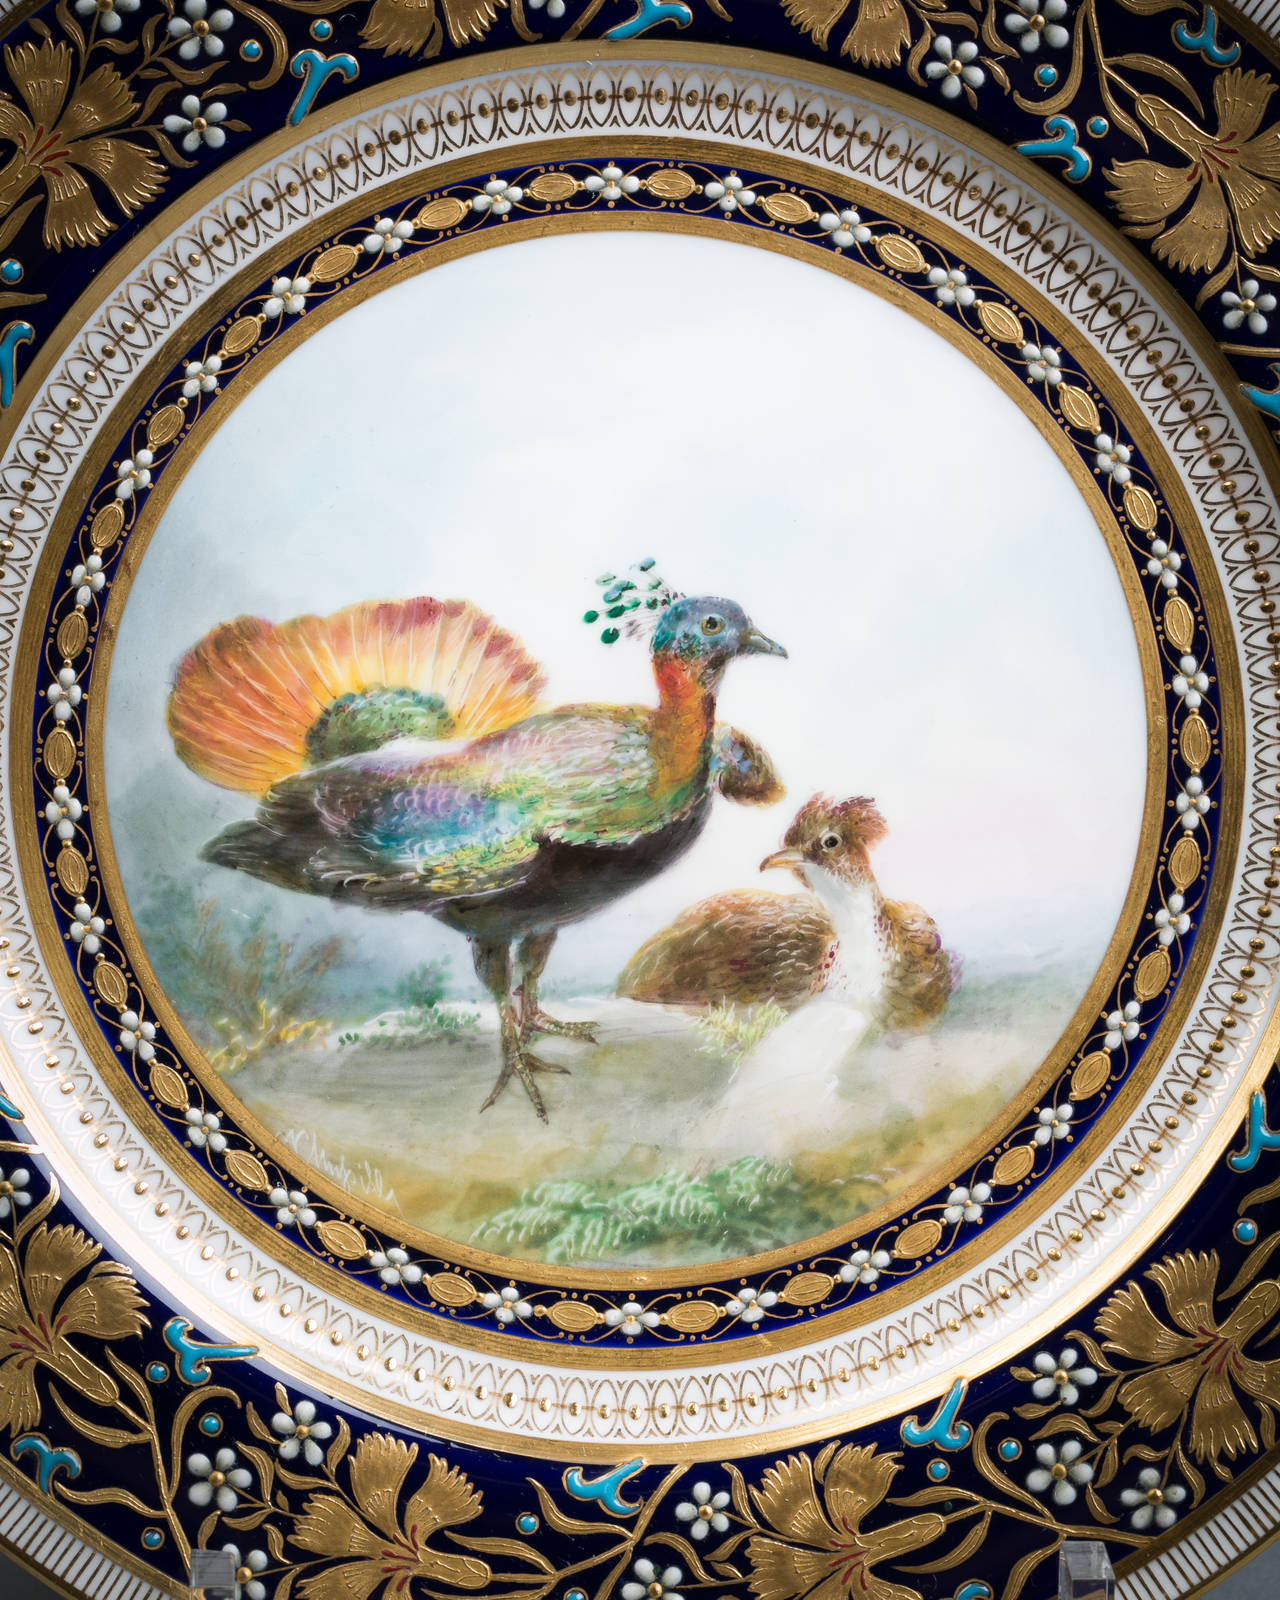 Late 19th Century Set of 18 English Porcelain Plates, Minton, circa 1890 For Sale